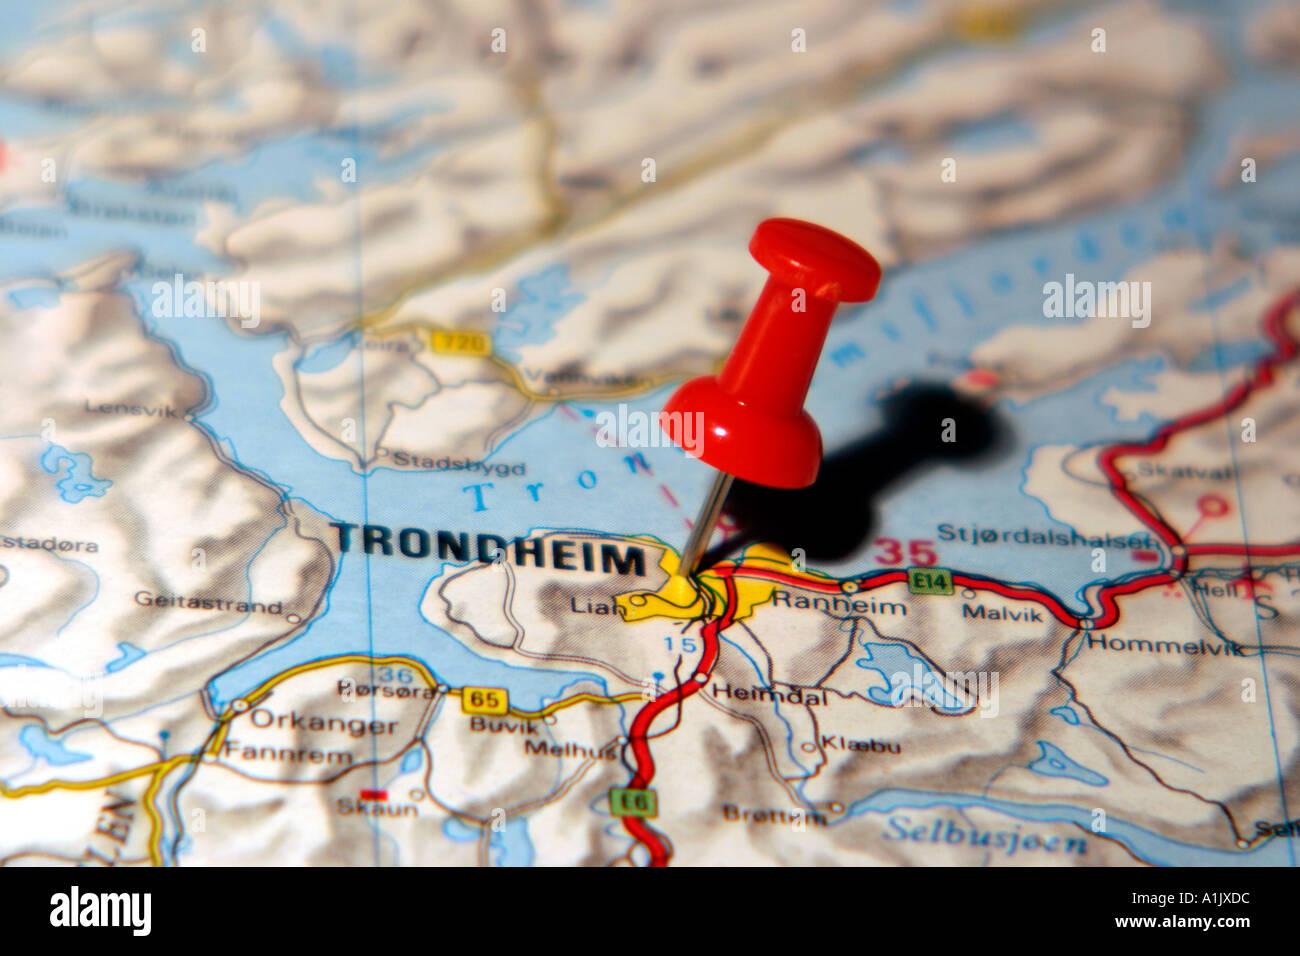 Trondheim Norway Map Stock Photos Trondheim Norway Map Stock